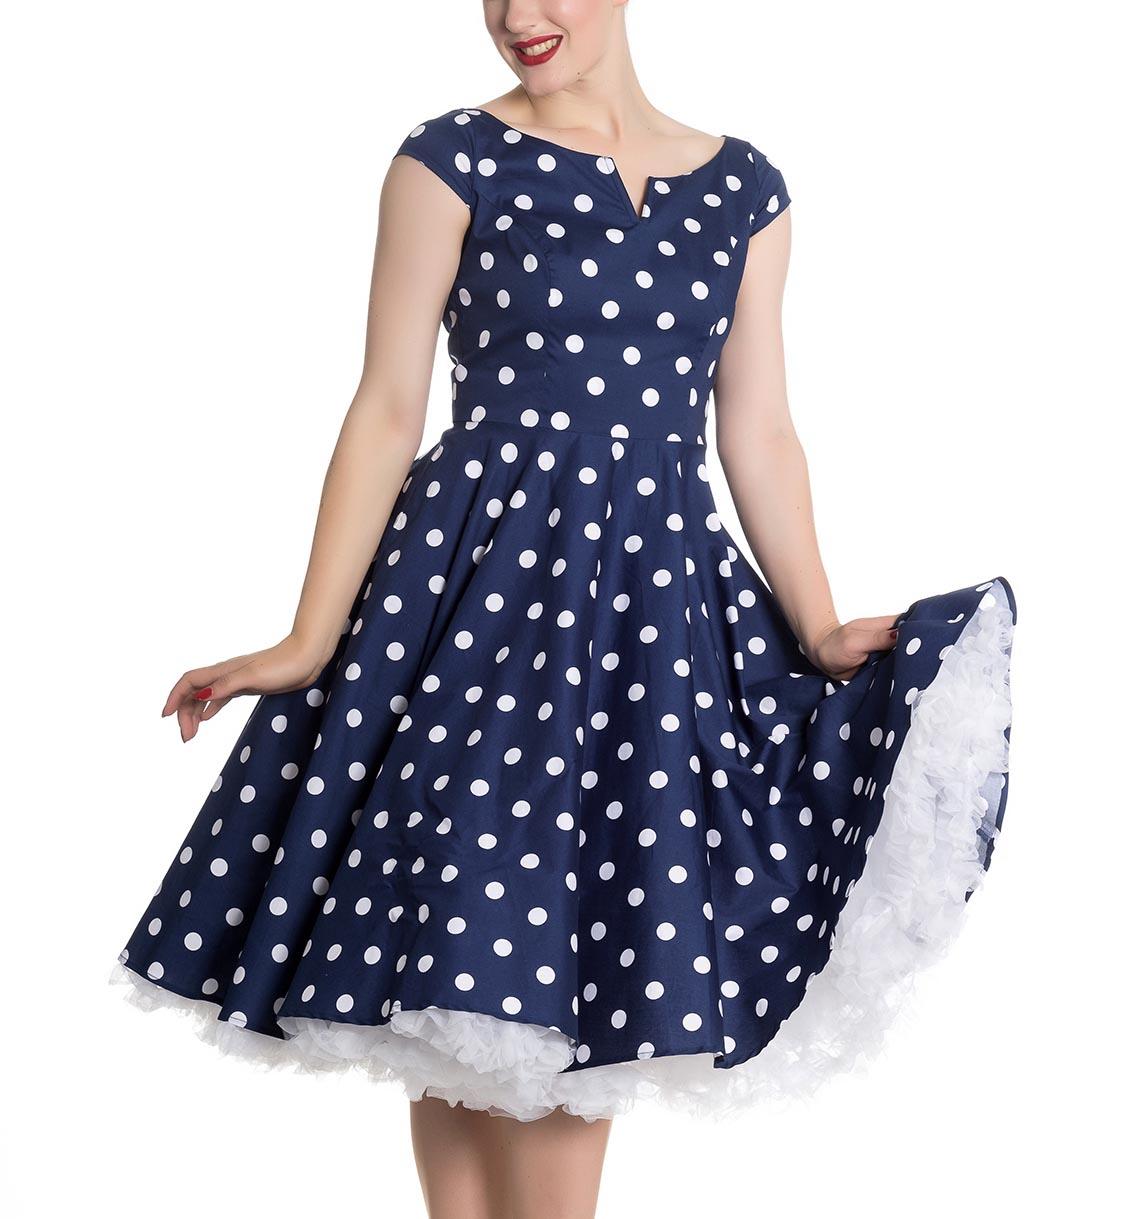 Hell-Bunny-50s-Dress-Polka-Dot-NICKY-Pin-Up-Rockabilly-Navy-Blue-All-Sizes thumbnail 3